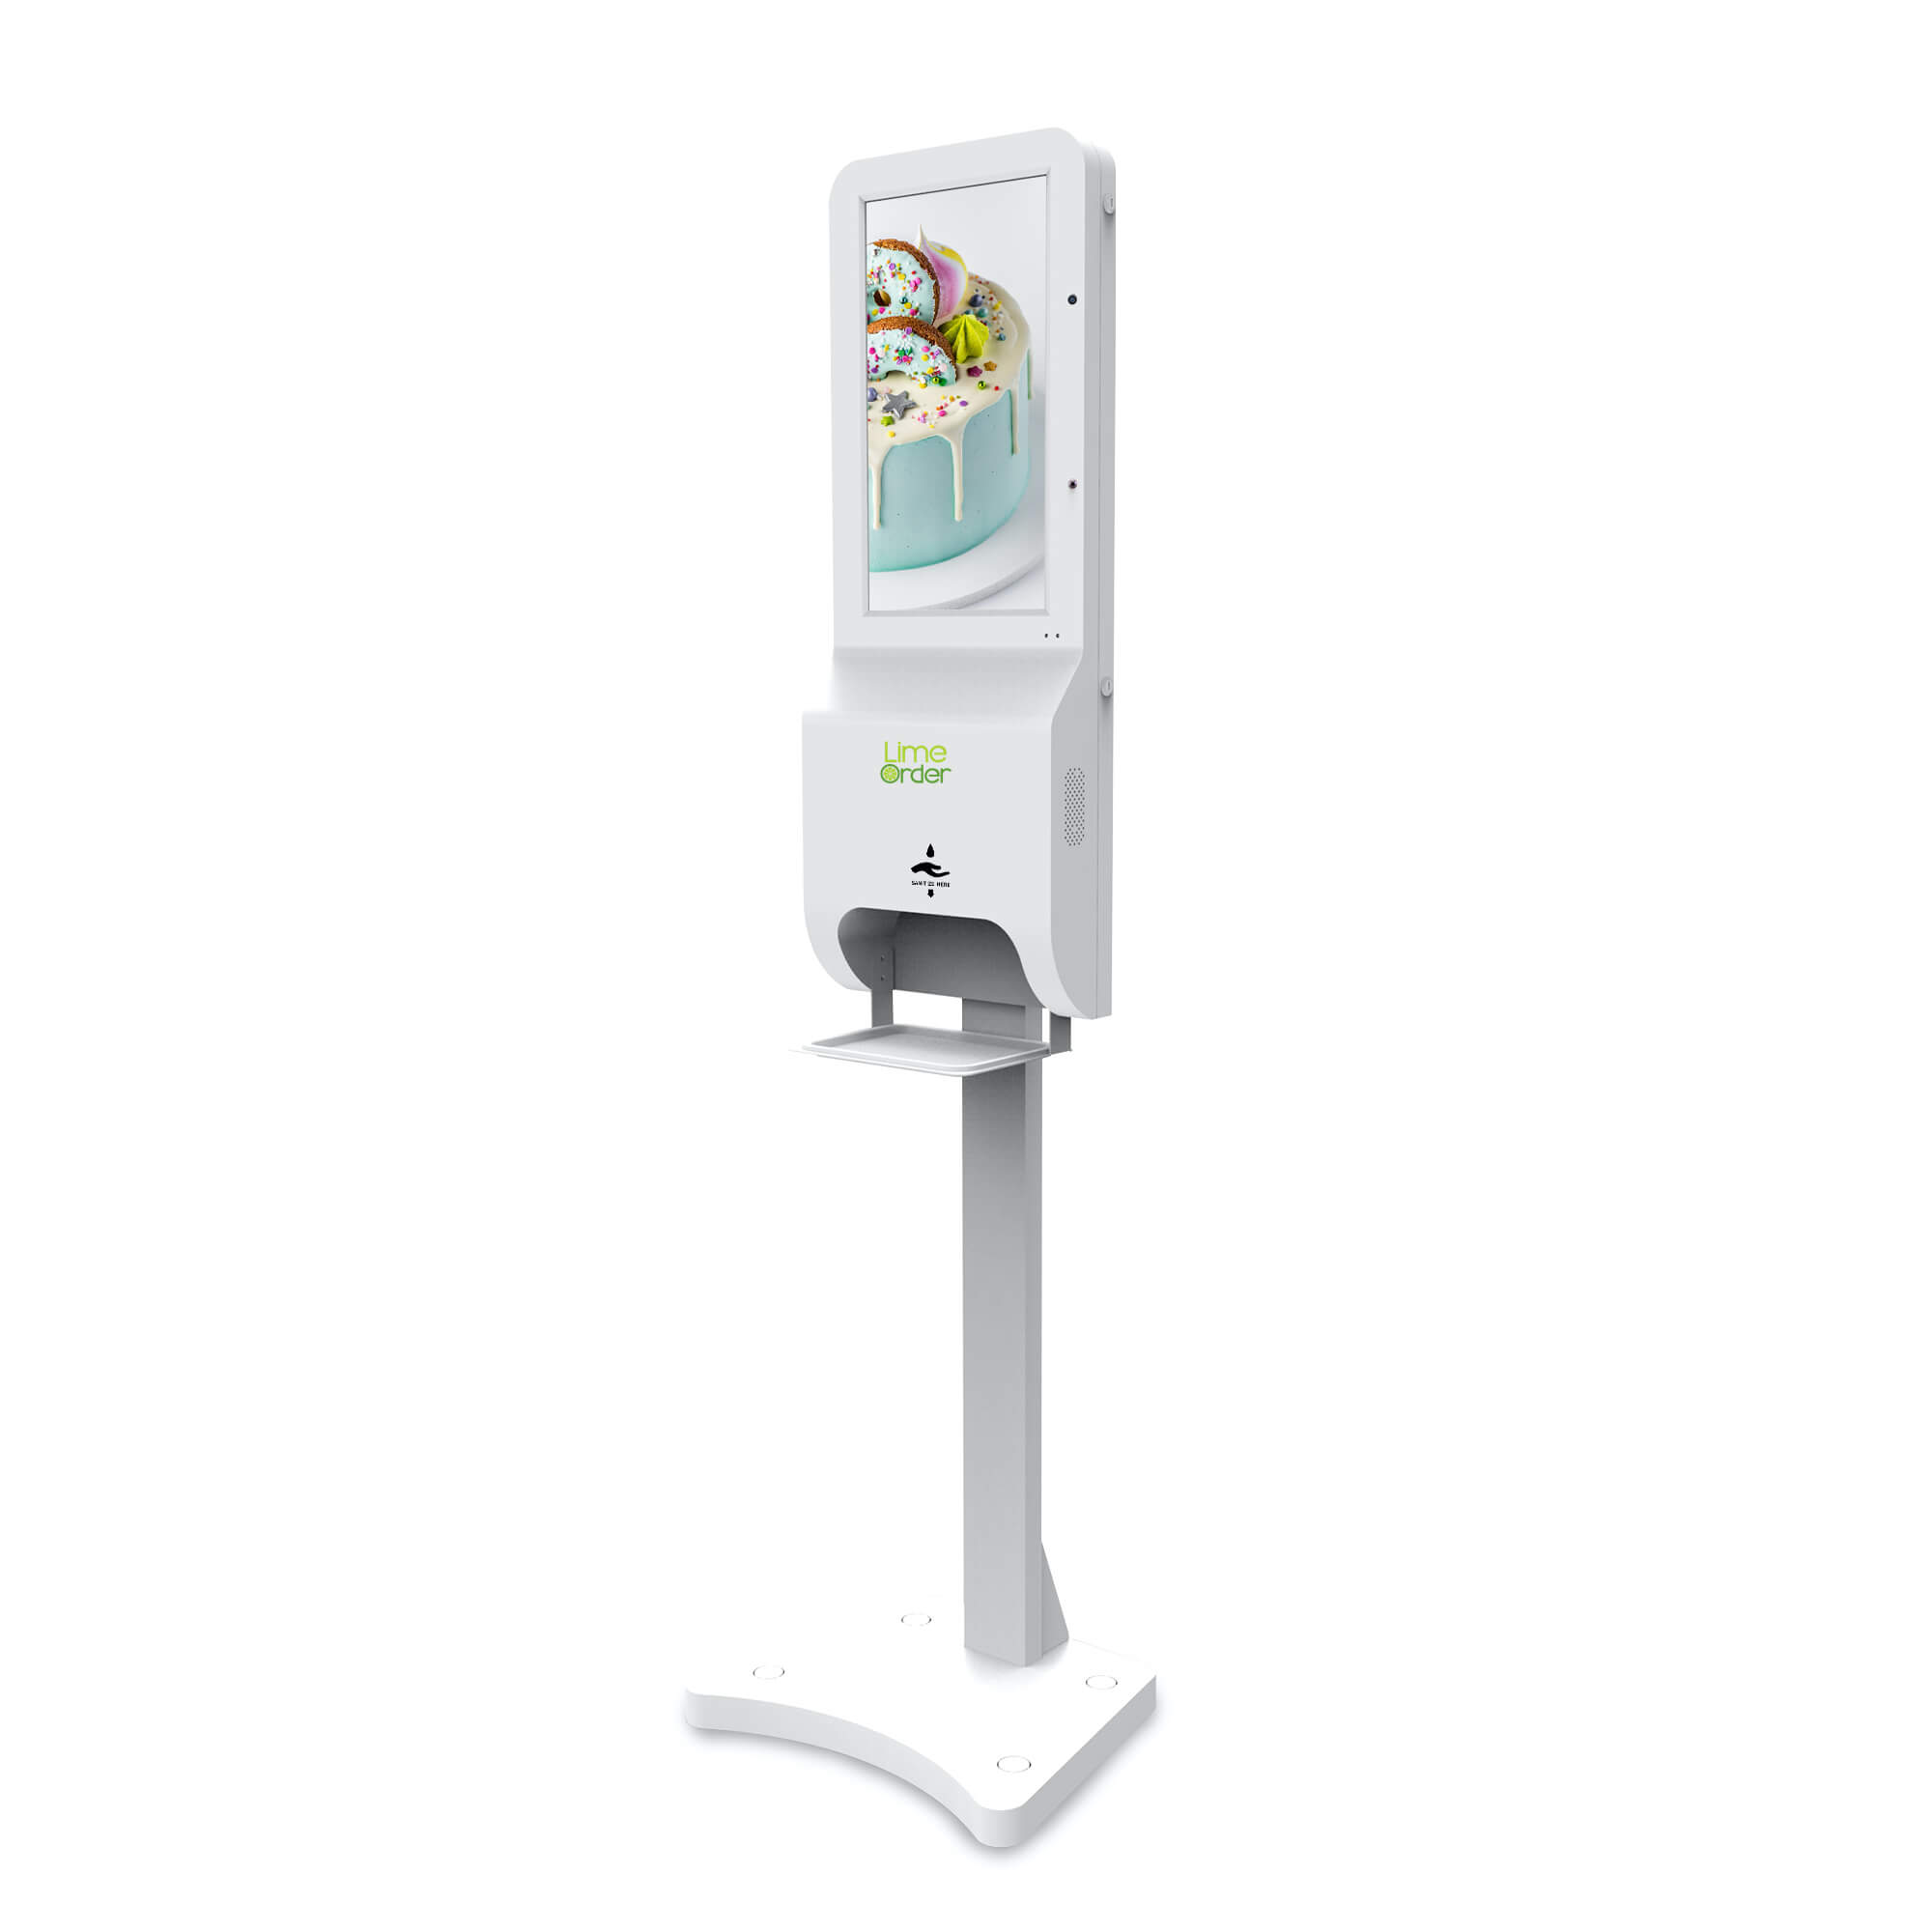 LimeOrder Temperature Sanitizer Kiosk 21 inch white2